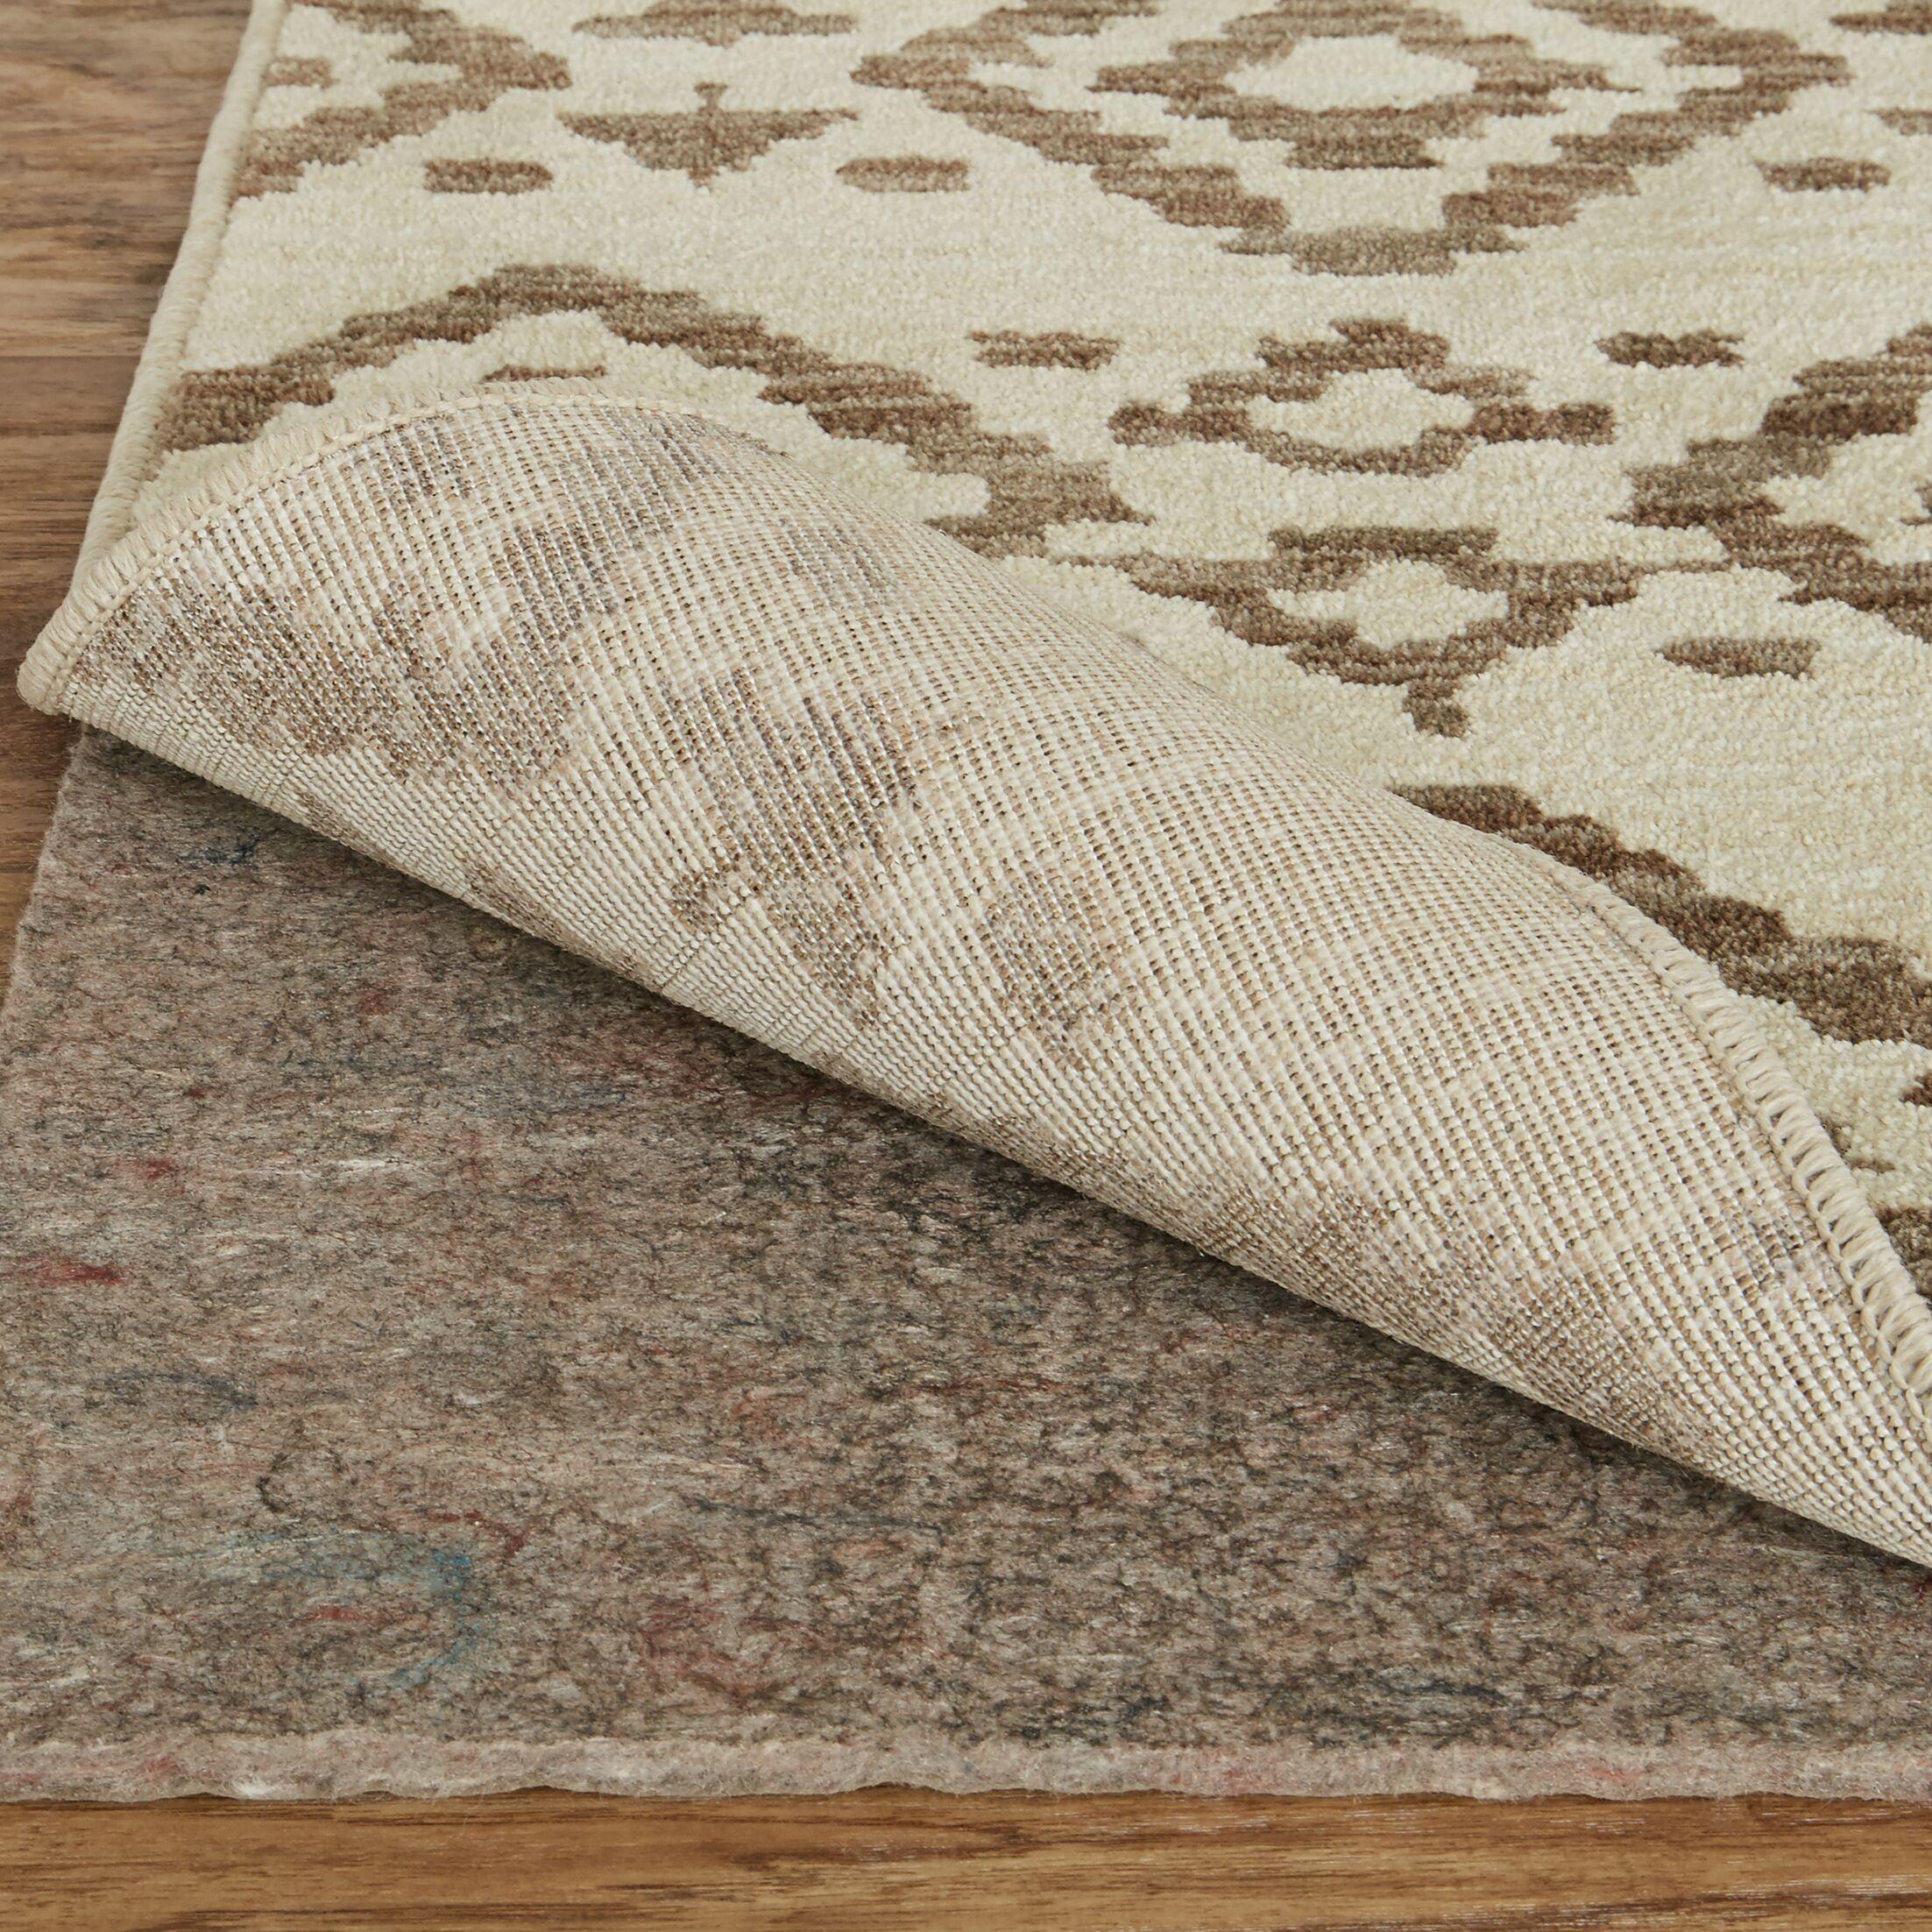 Mohawk Studio Tangier Beige/Brown Area Rug Rug Size: Rectangle 5'3